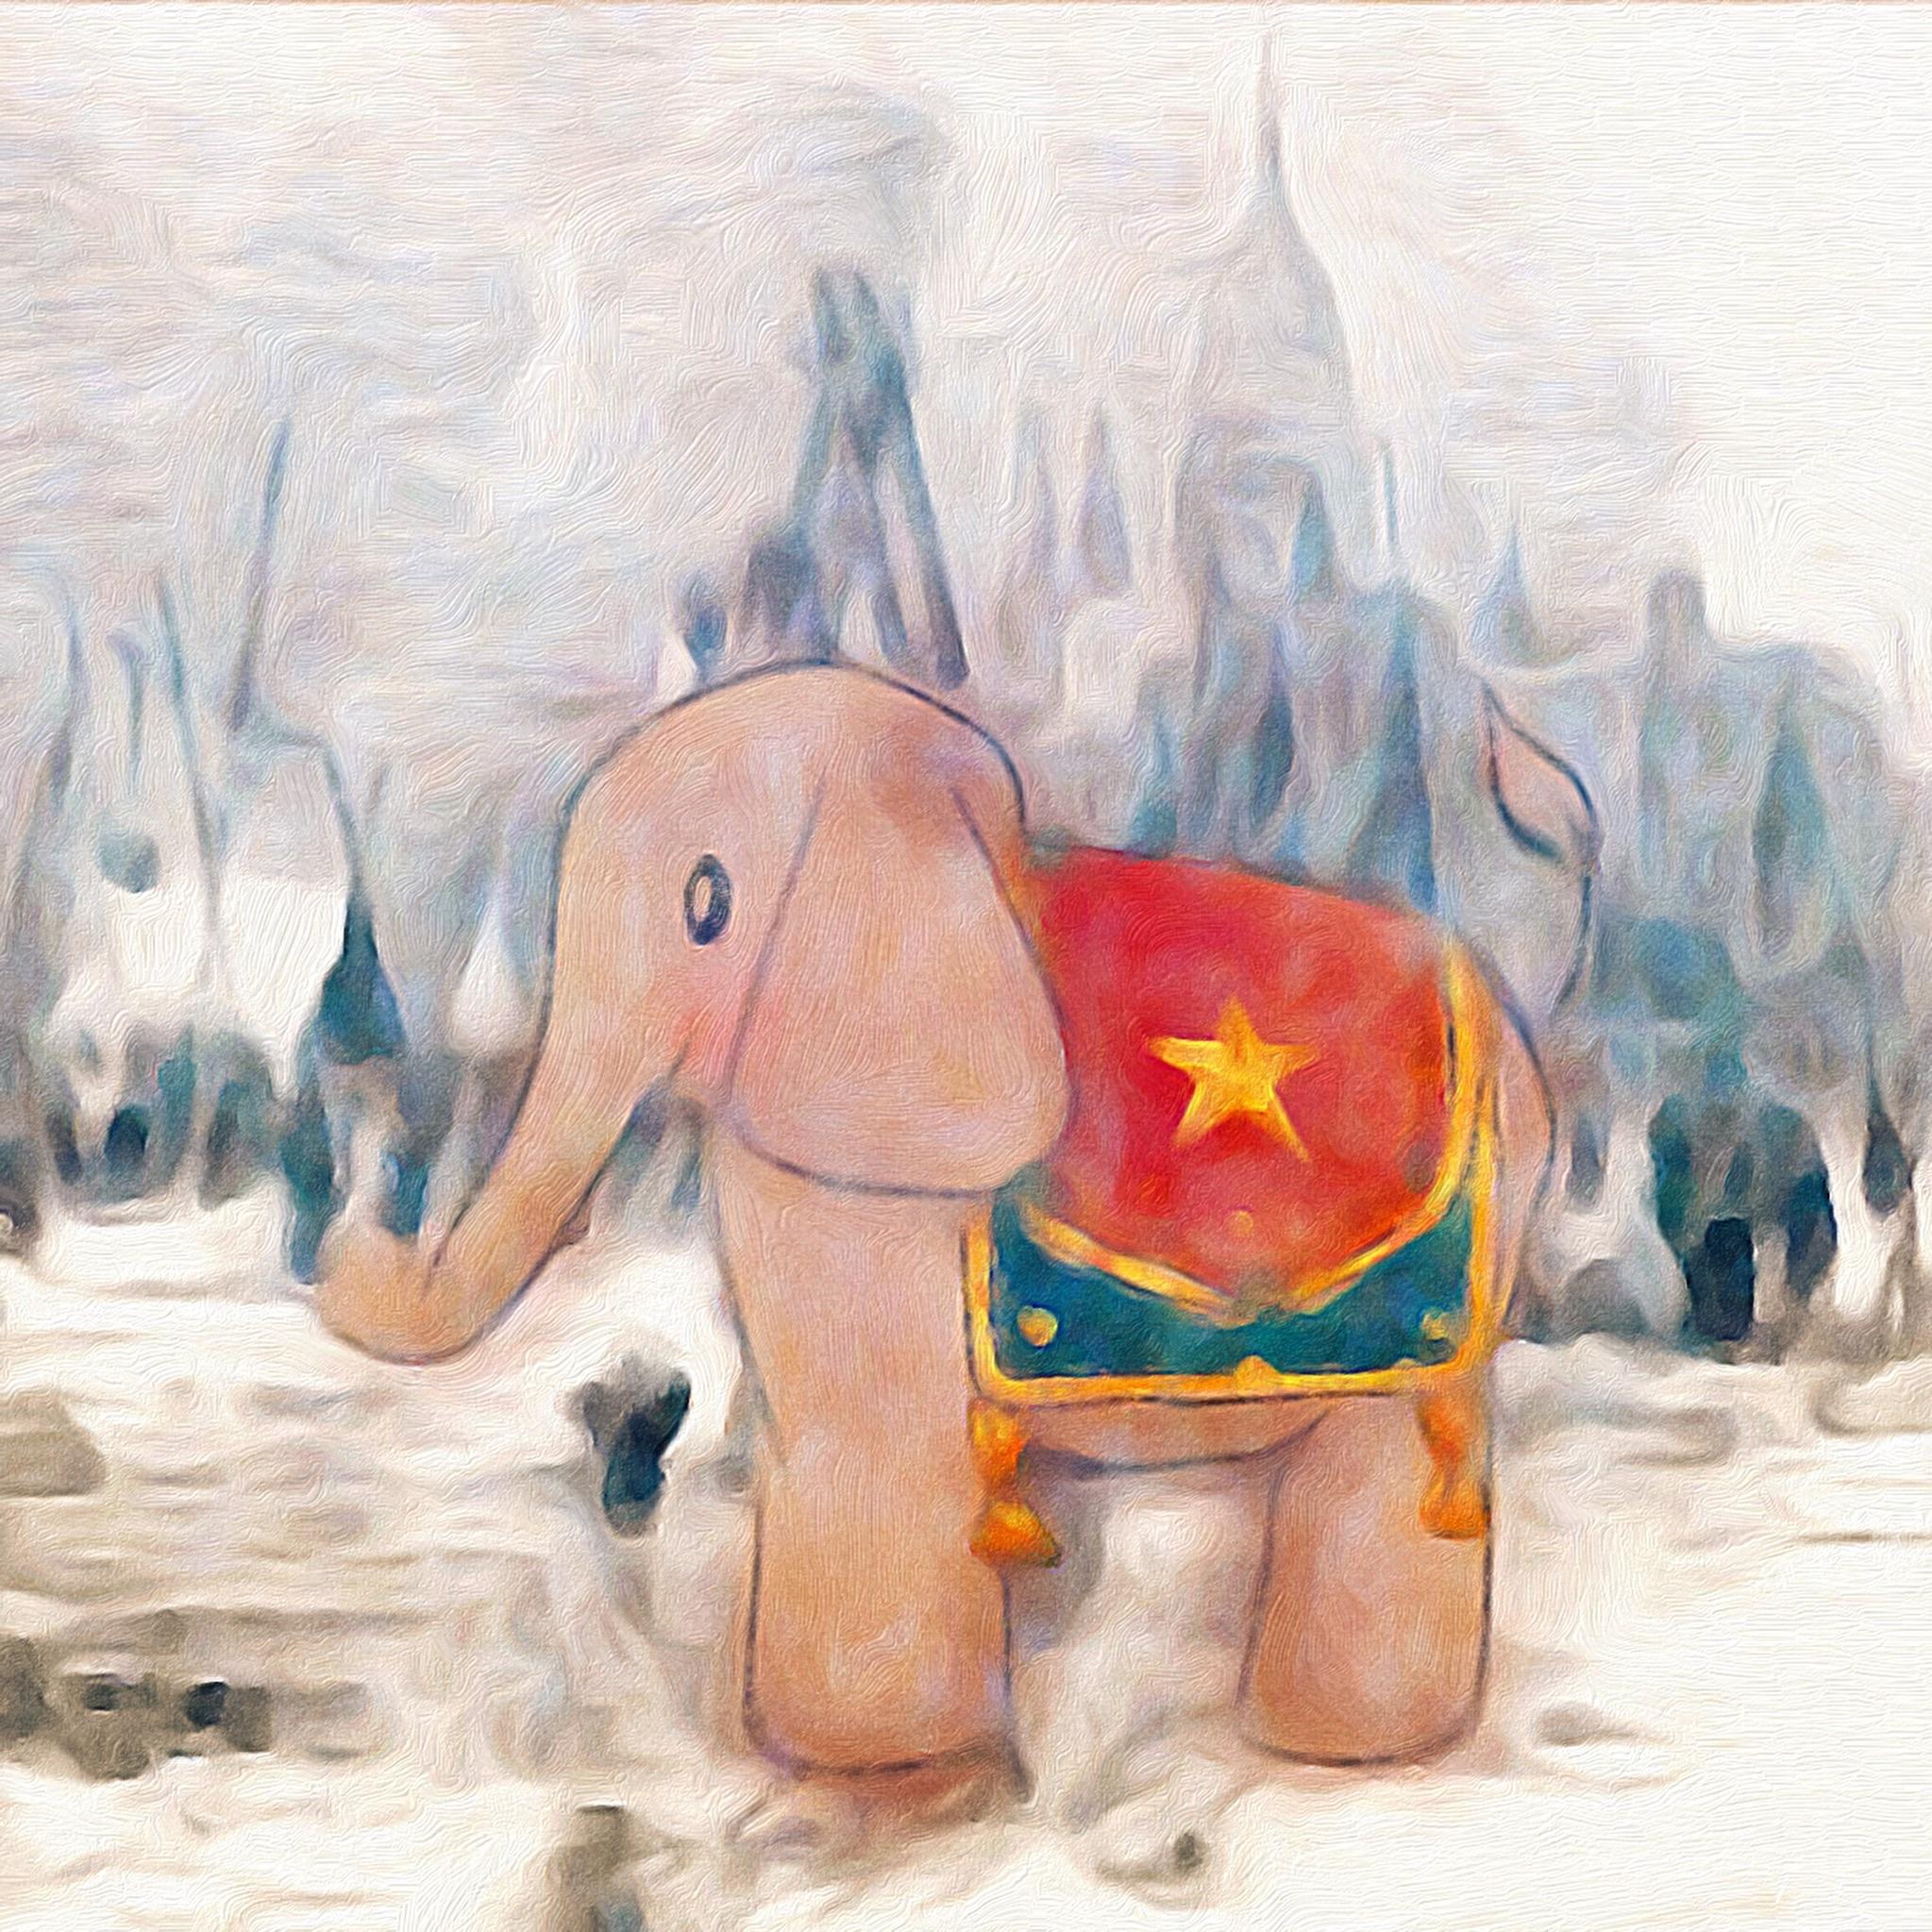 elephant-Thames-frost-fairs-illustration.jpg